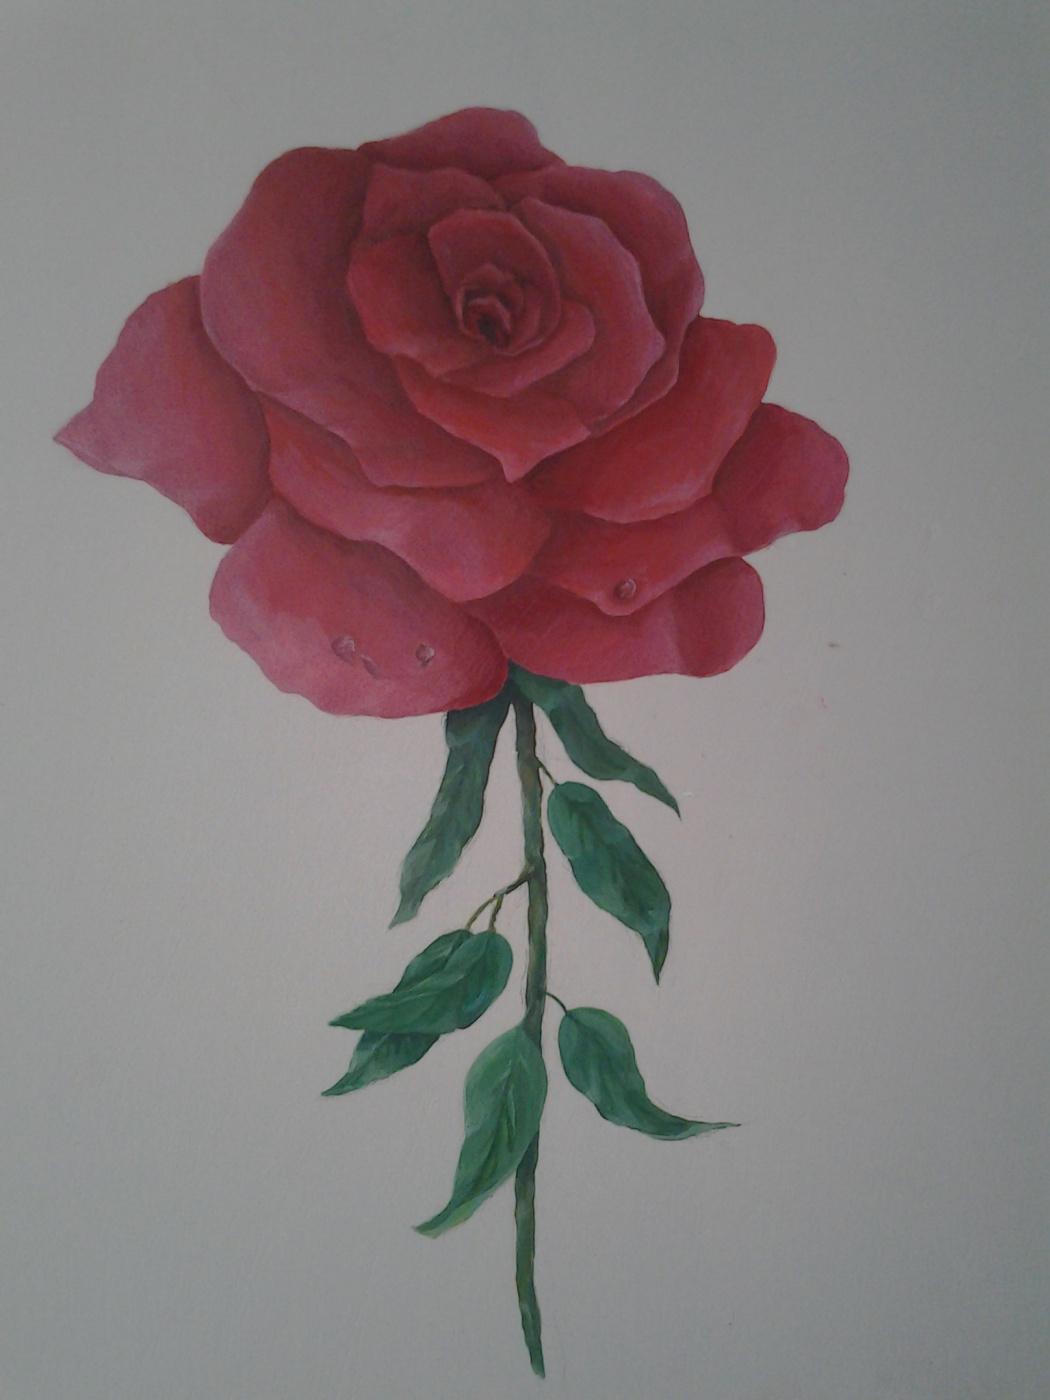 Mihran Mkrtumyan. Rose on the wall